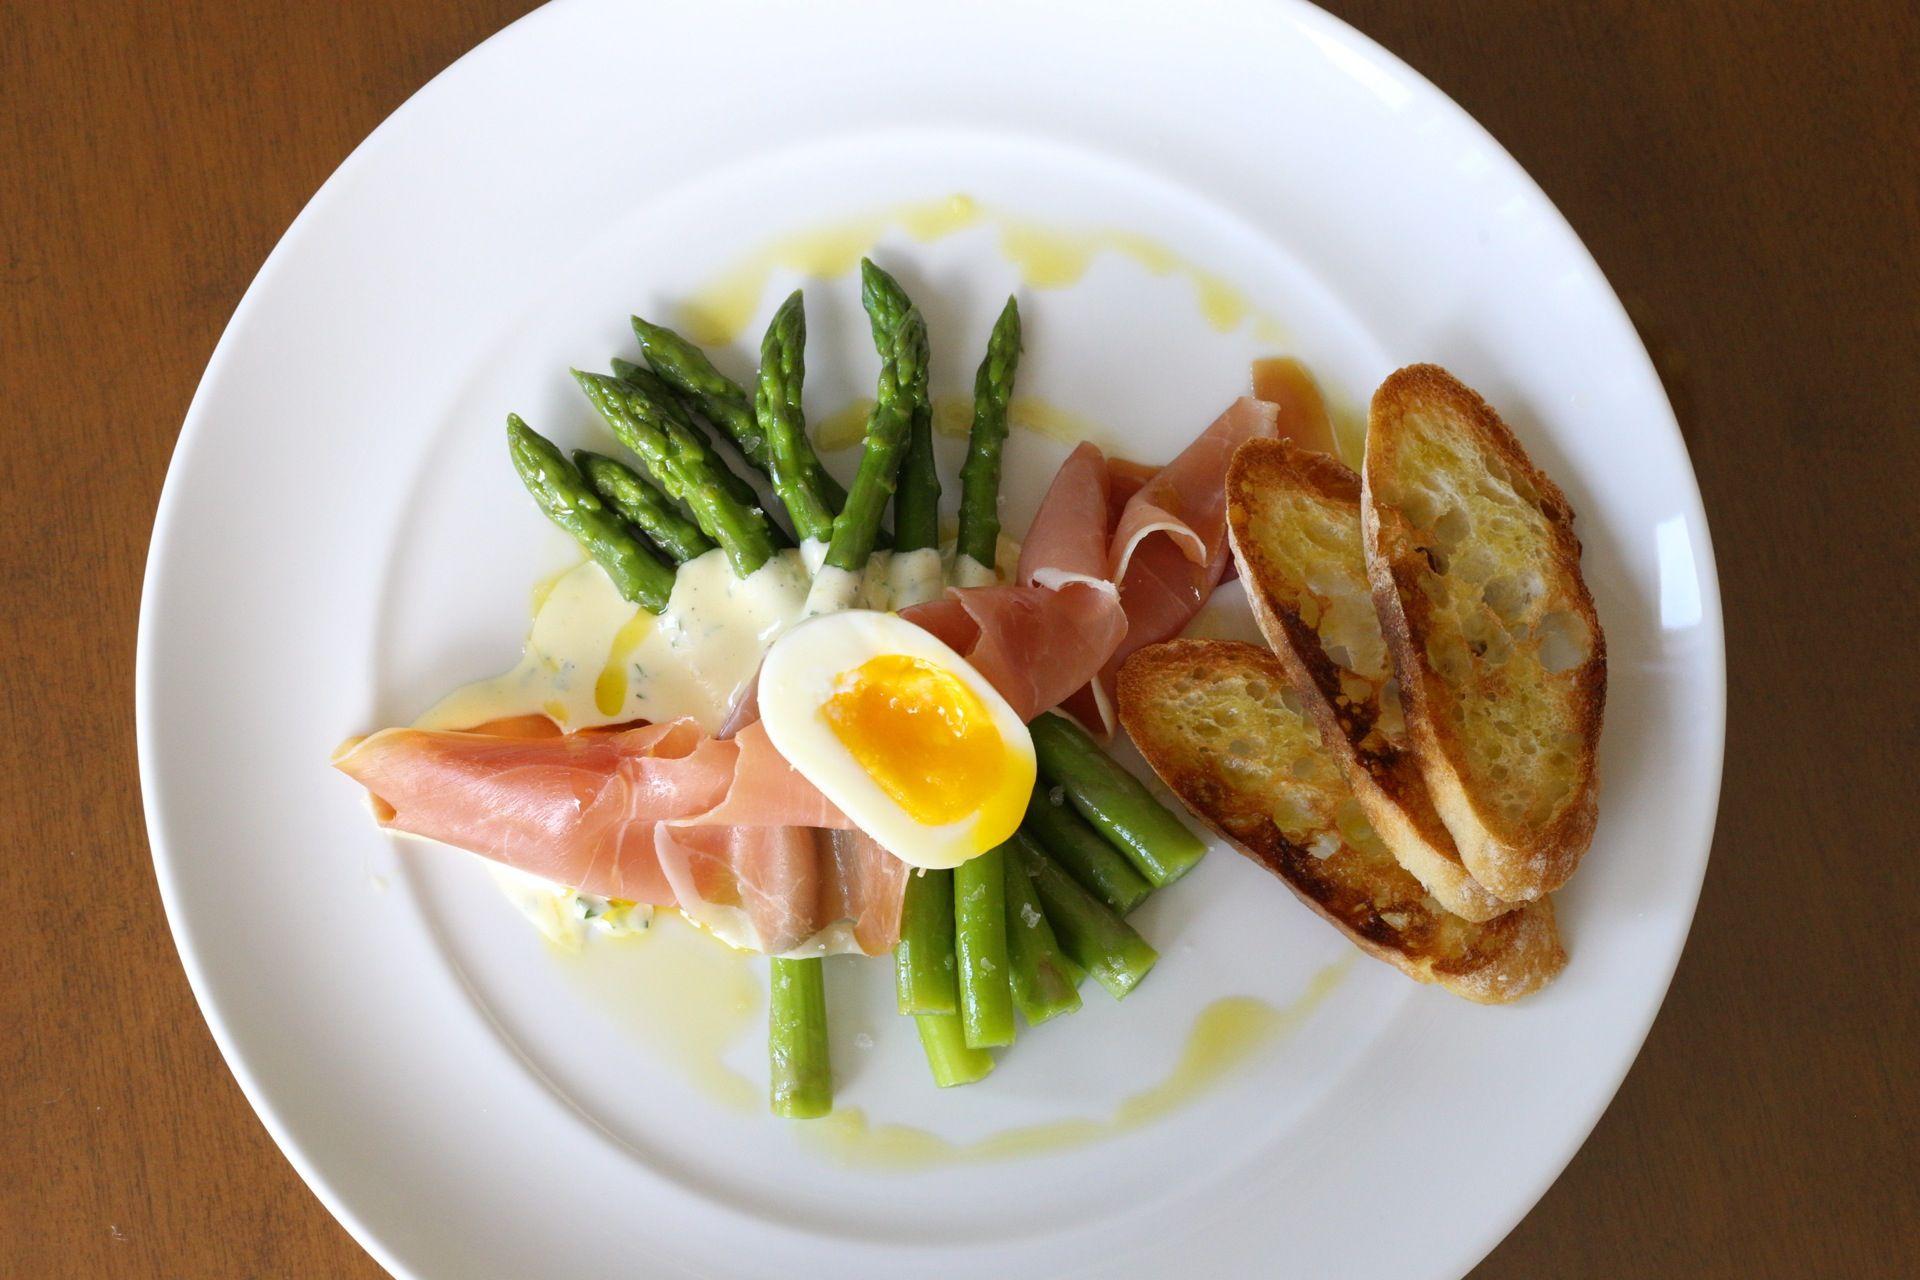 Serrano Ham, Asparagus, Hollandaise, 6 Minute Egg